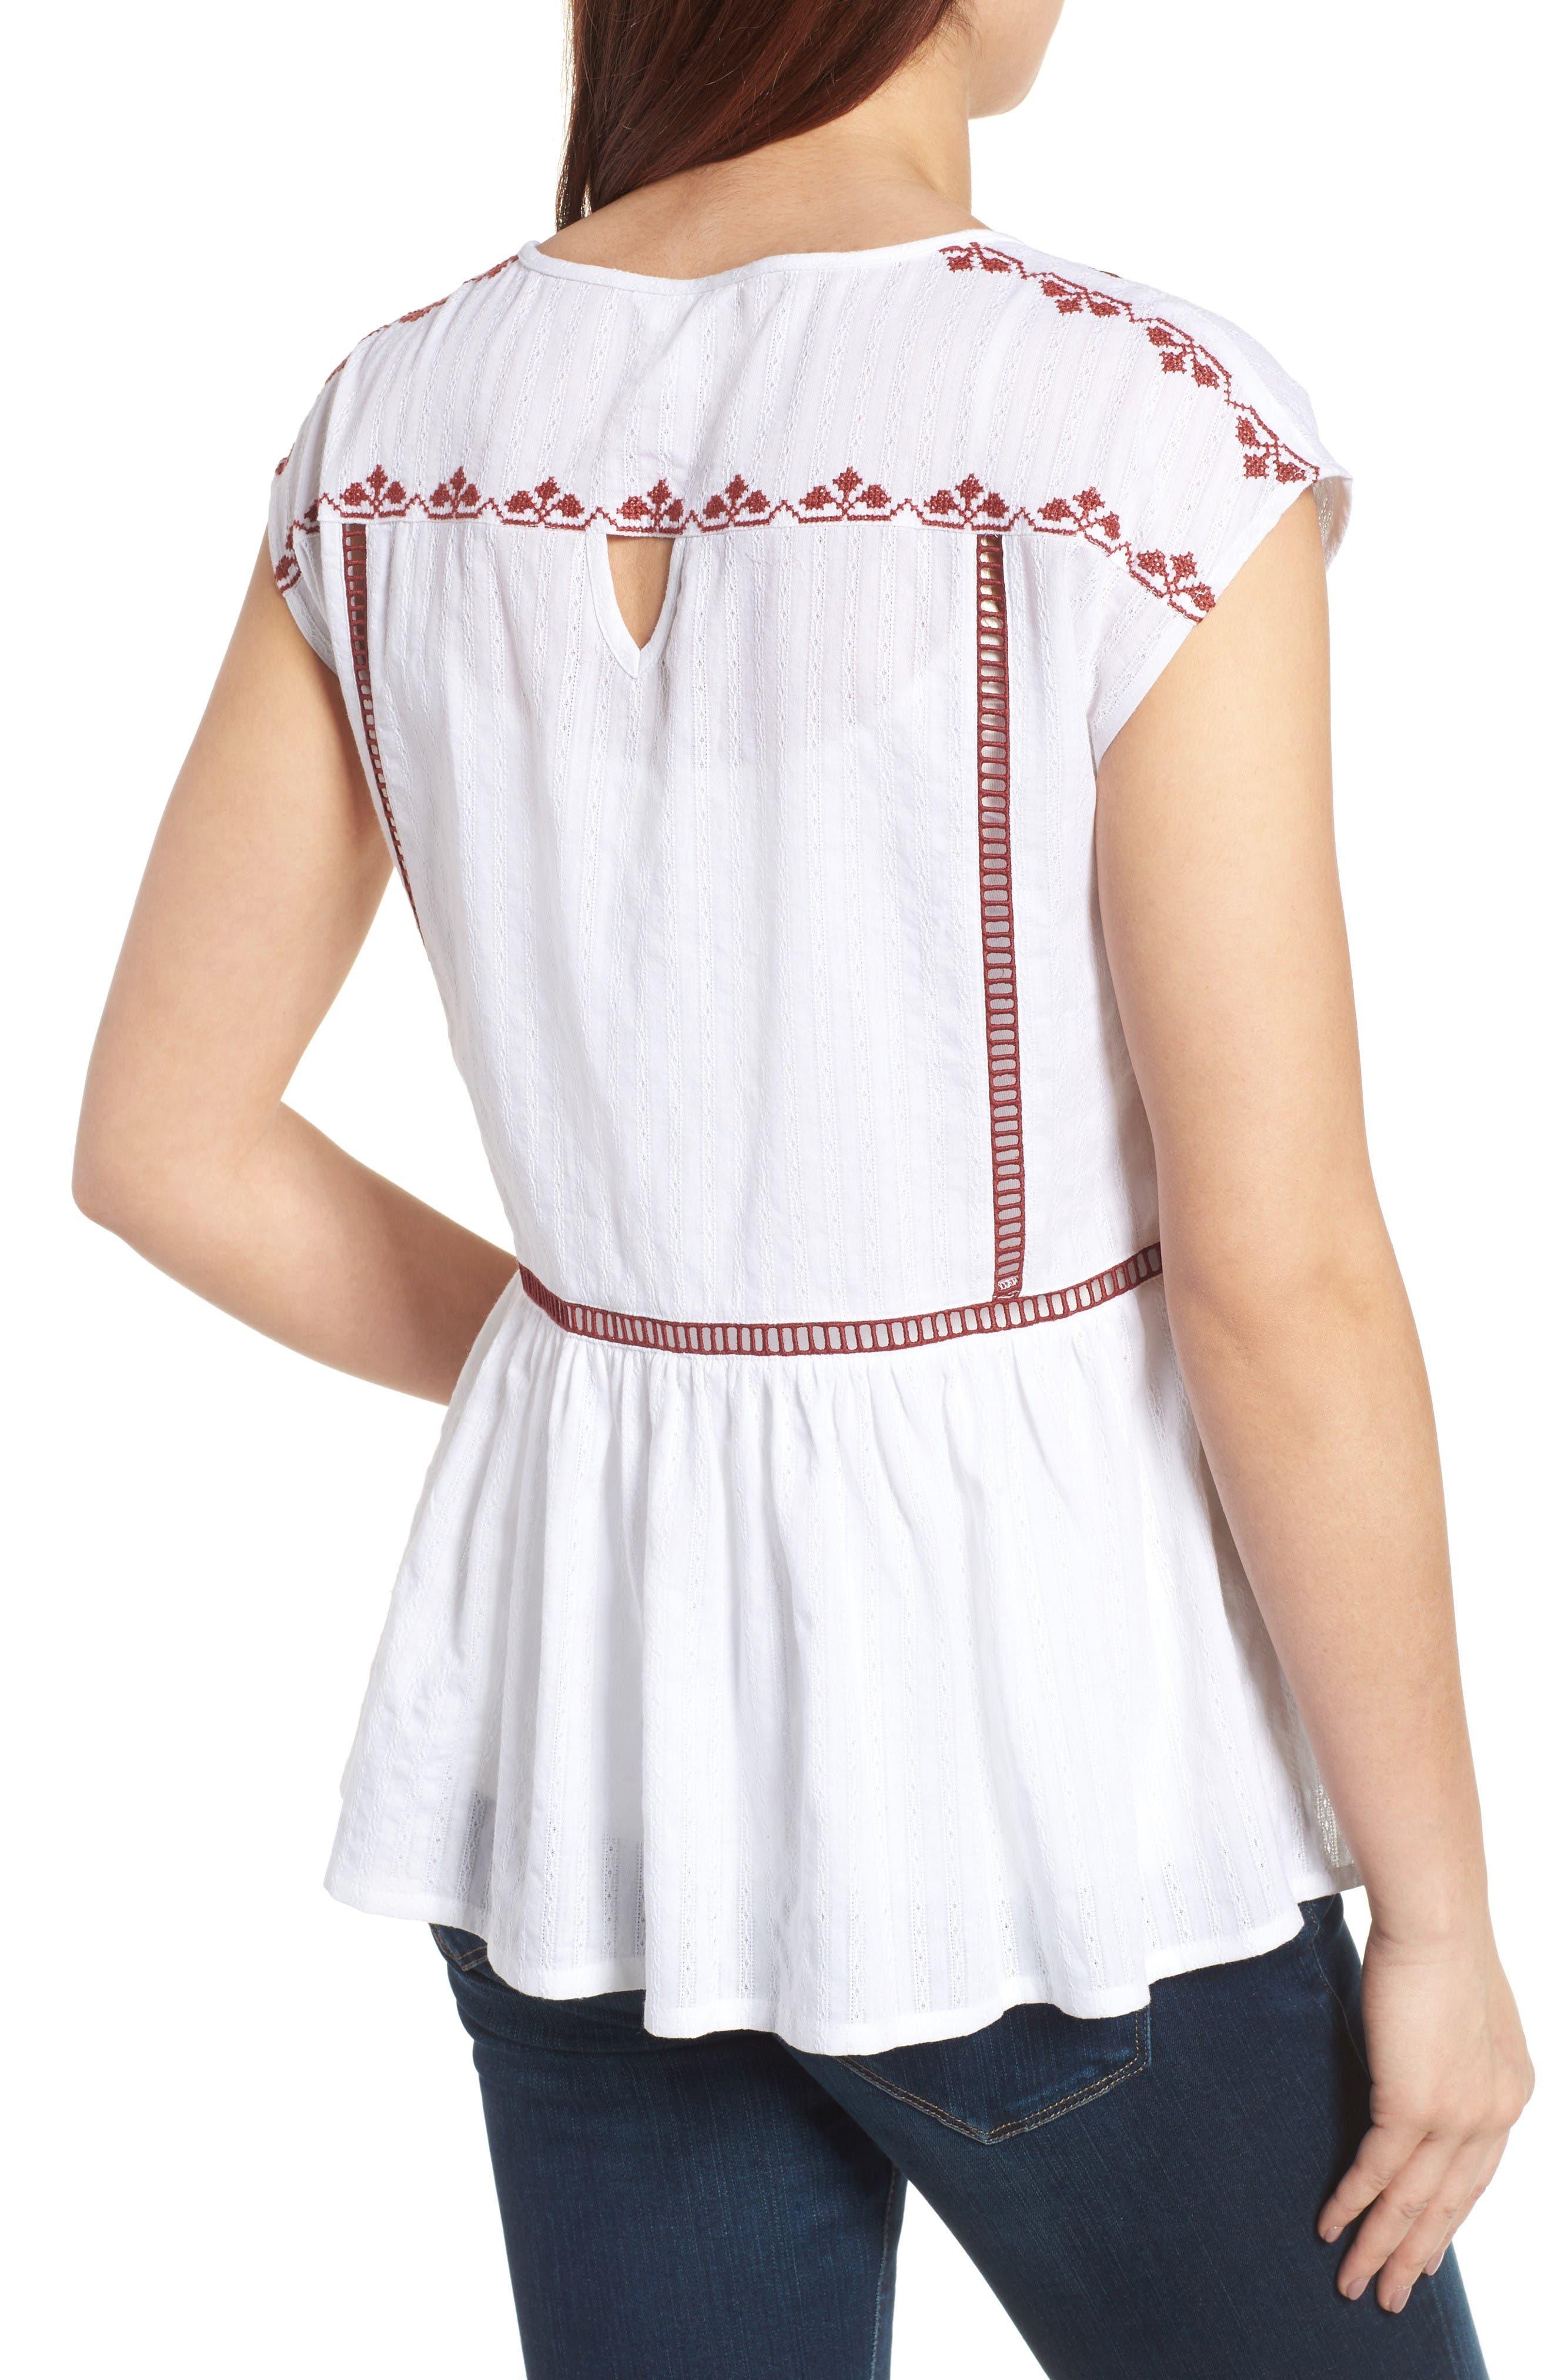 Alternate Image 3  - Caslon® Embroidered Cotton Top (Regular & Petite)